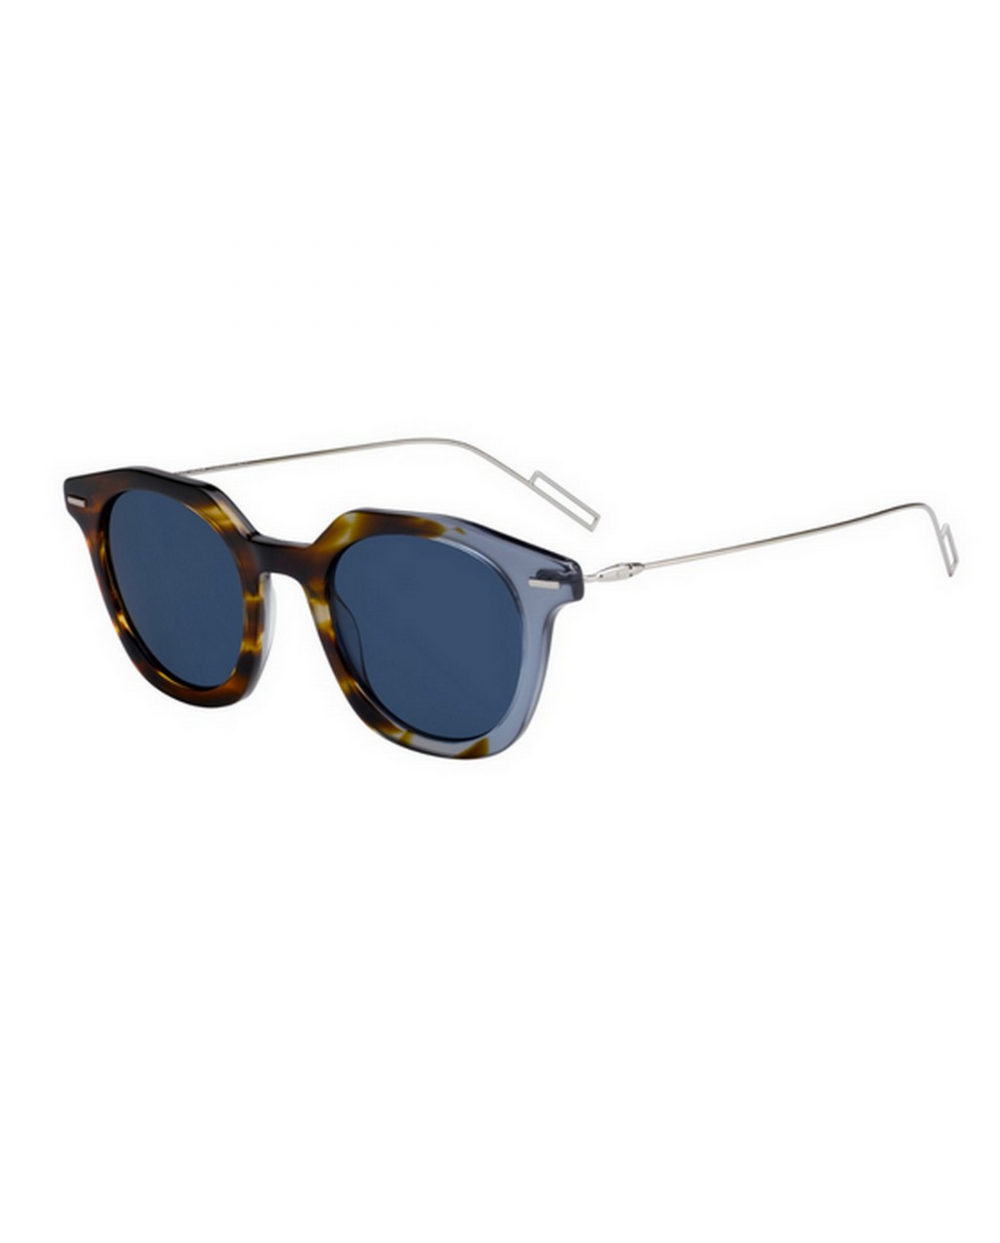 Sonnenbrille Christian Dior DIORMASTER verpackung origianale garantie italien